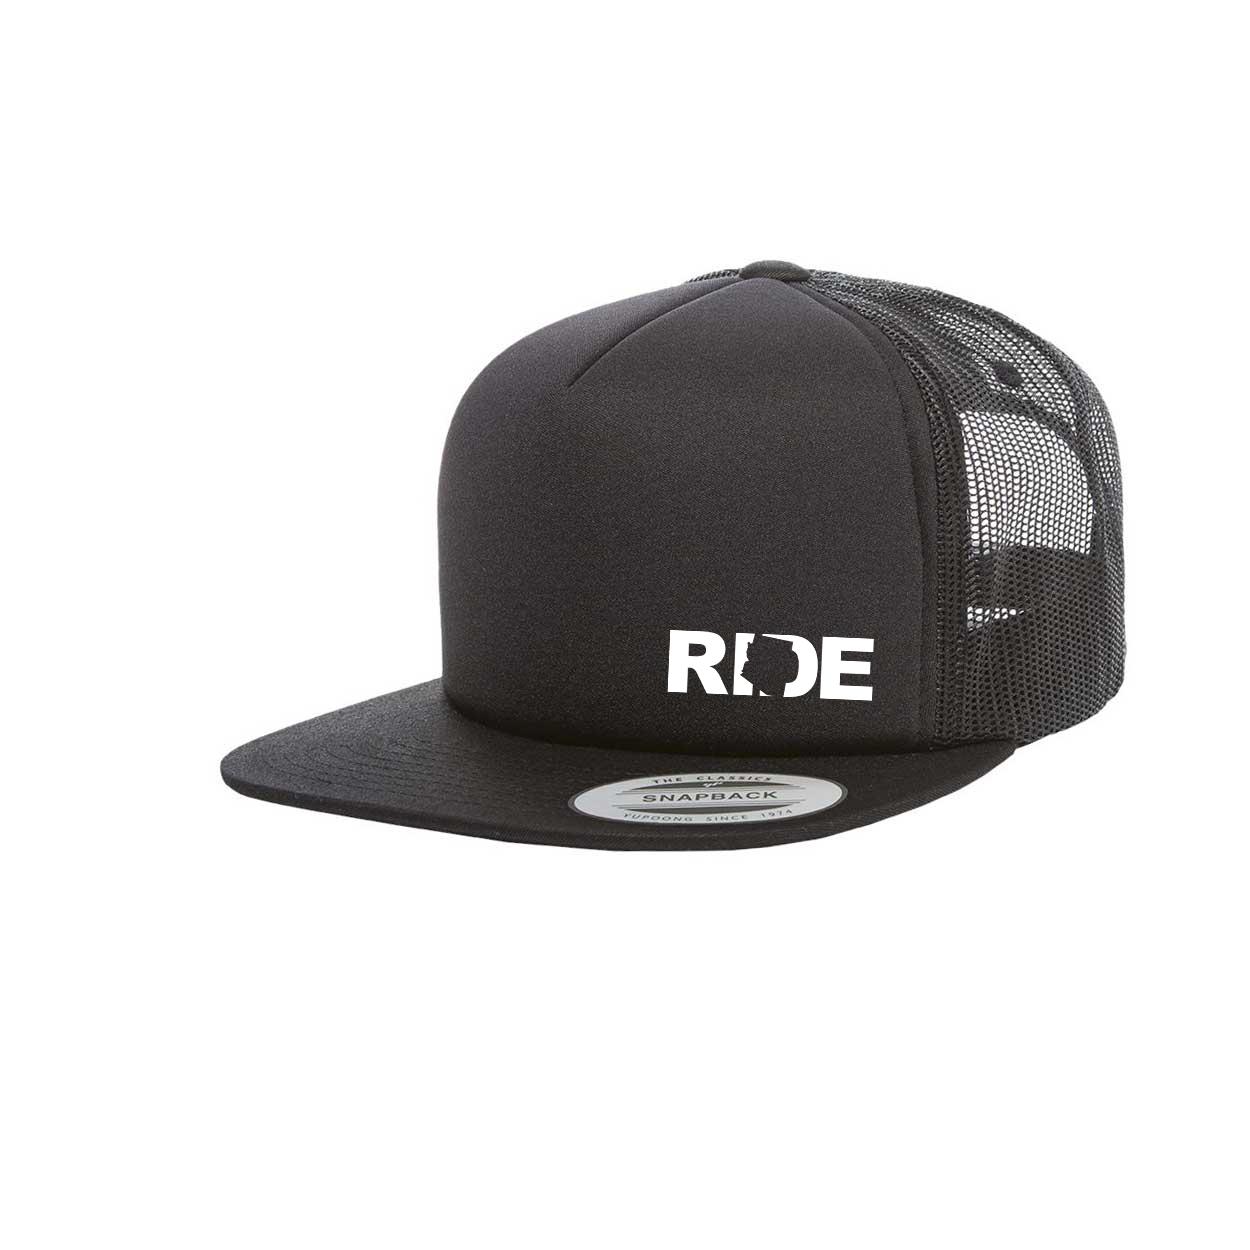 Ride Arizona Night Out Premium Foam Flat Brim Snapback Hat Black (White Logo)